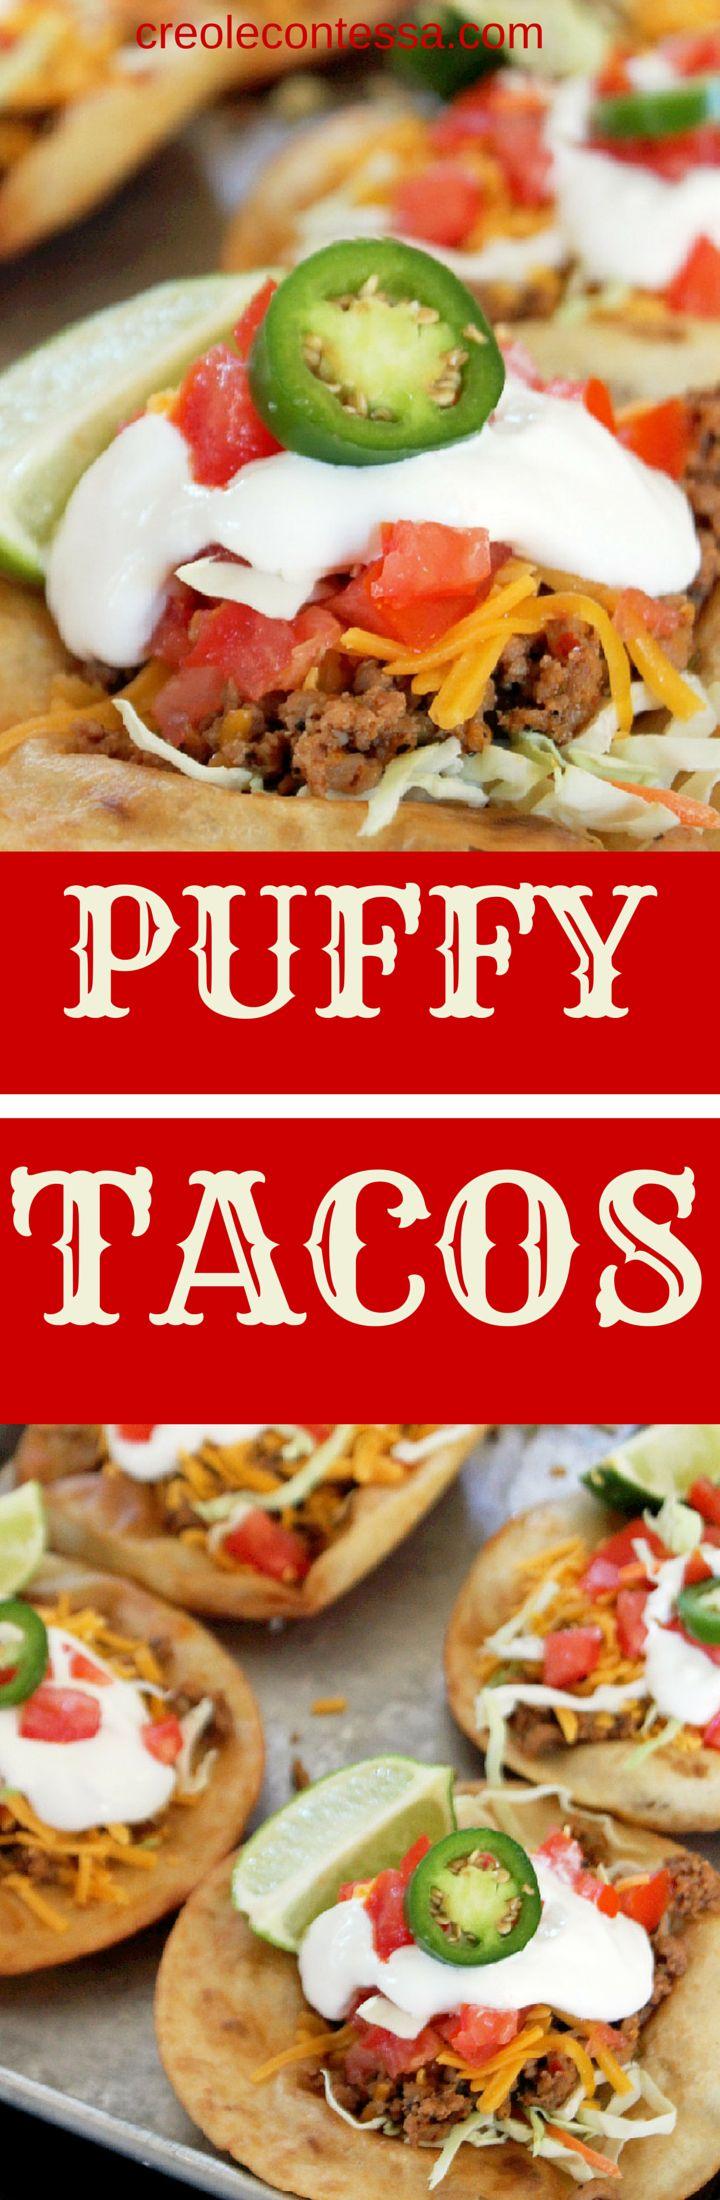 Puffy Tacos-Creole Contessa